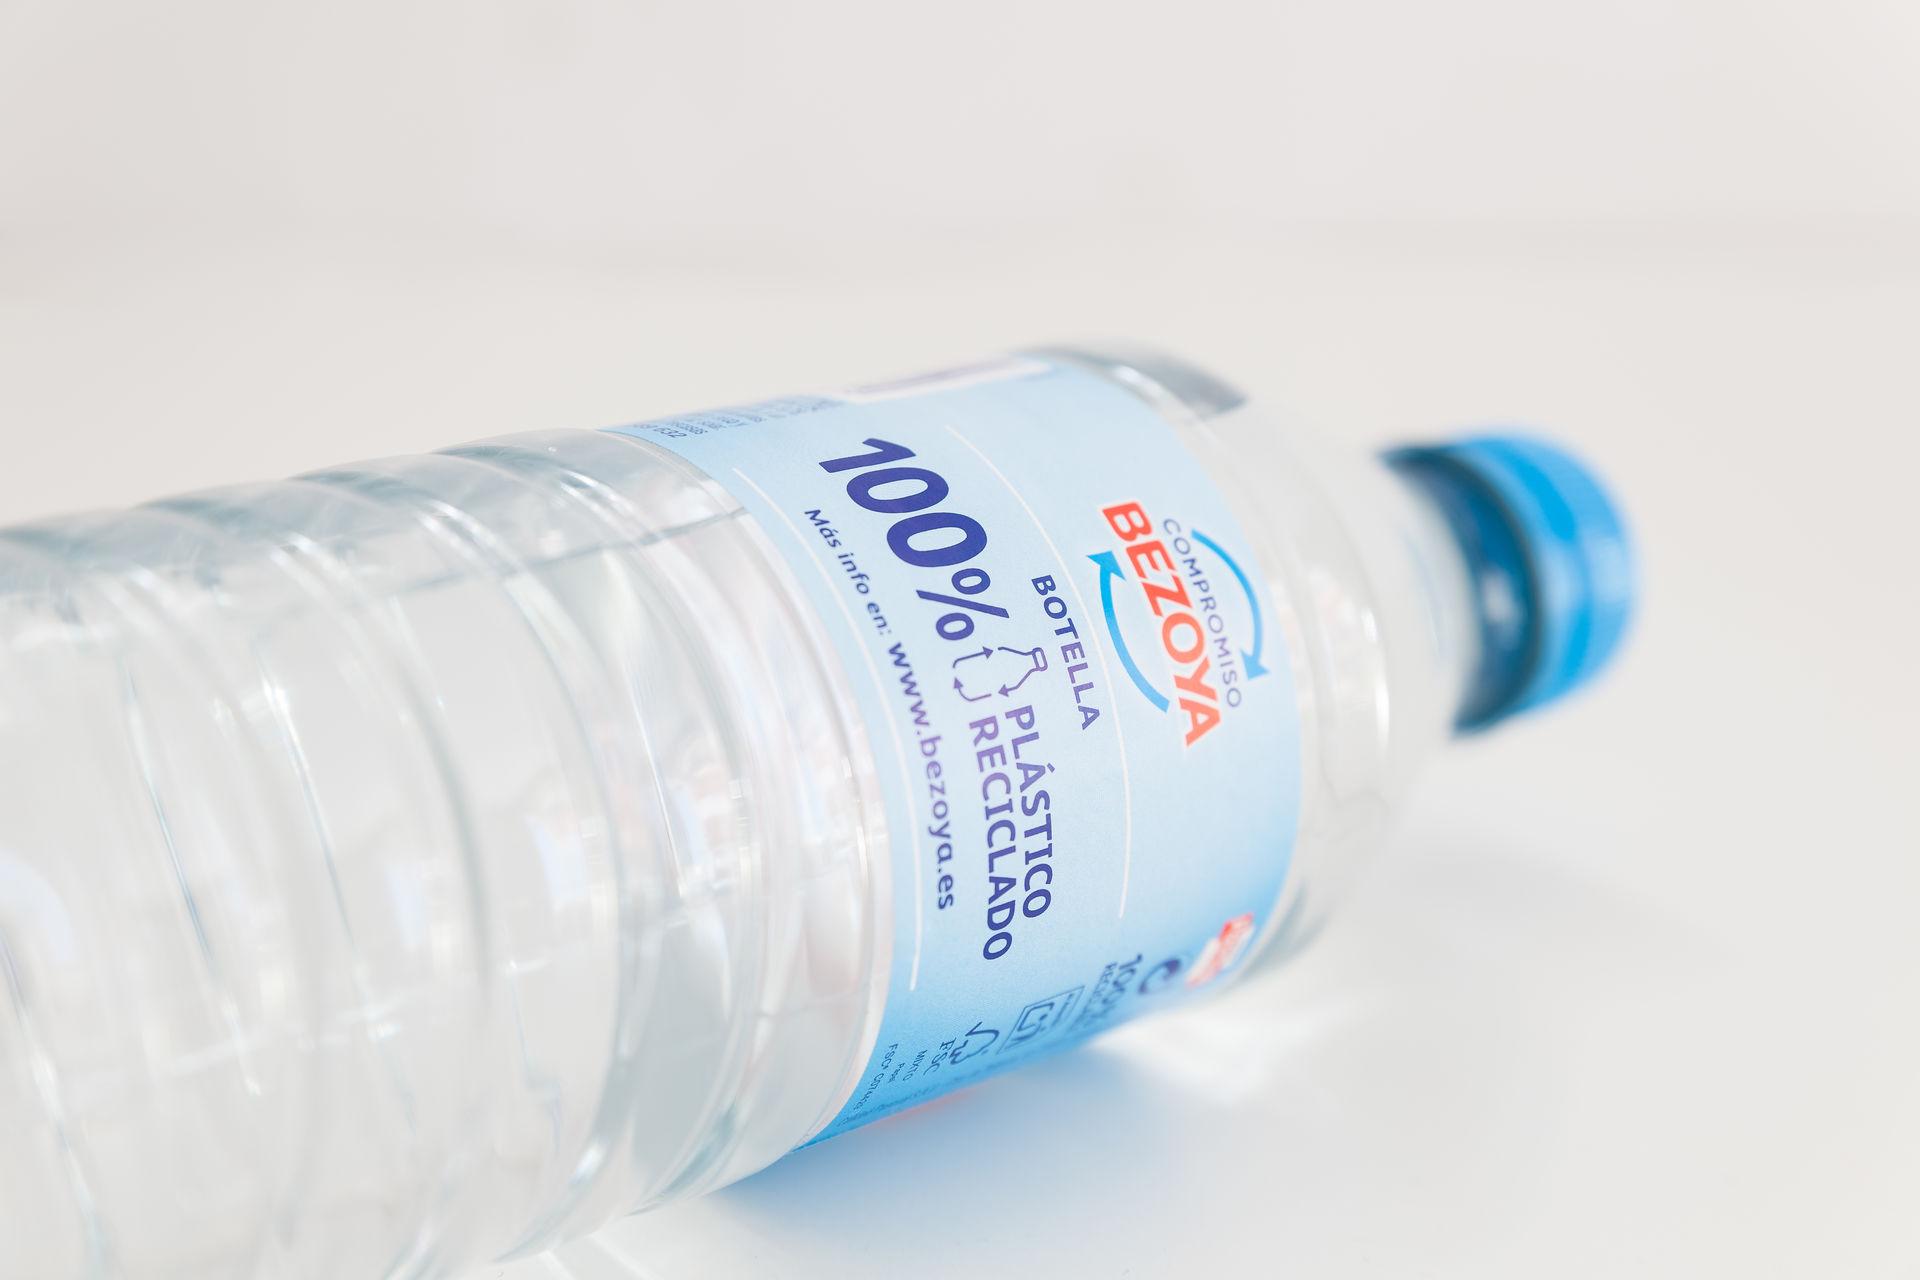 bezoya-botella-reciclada-dos.jpg